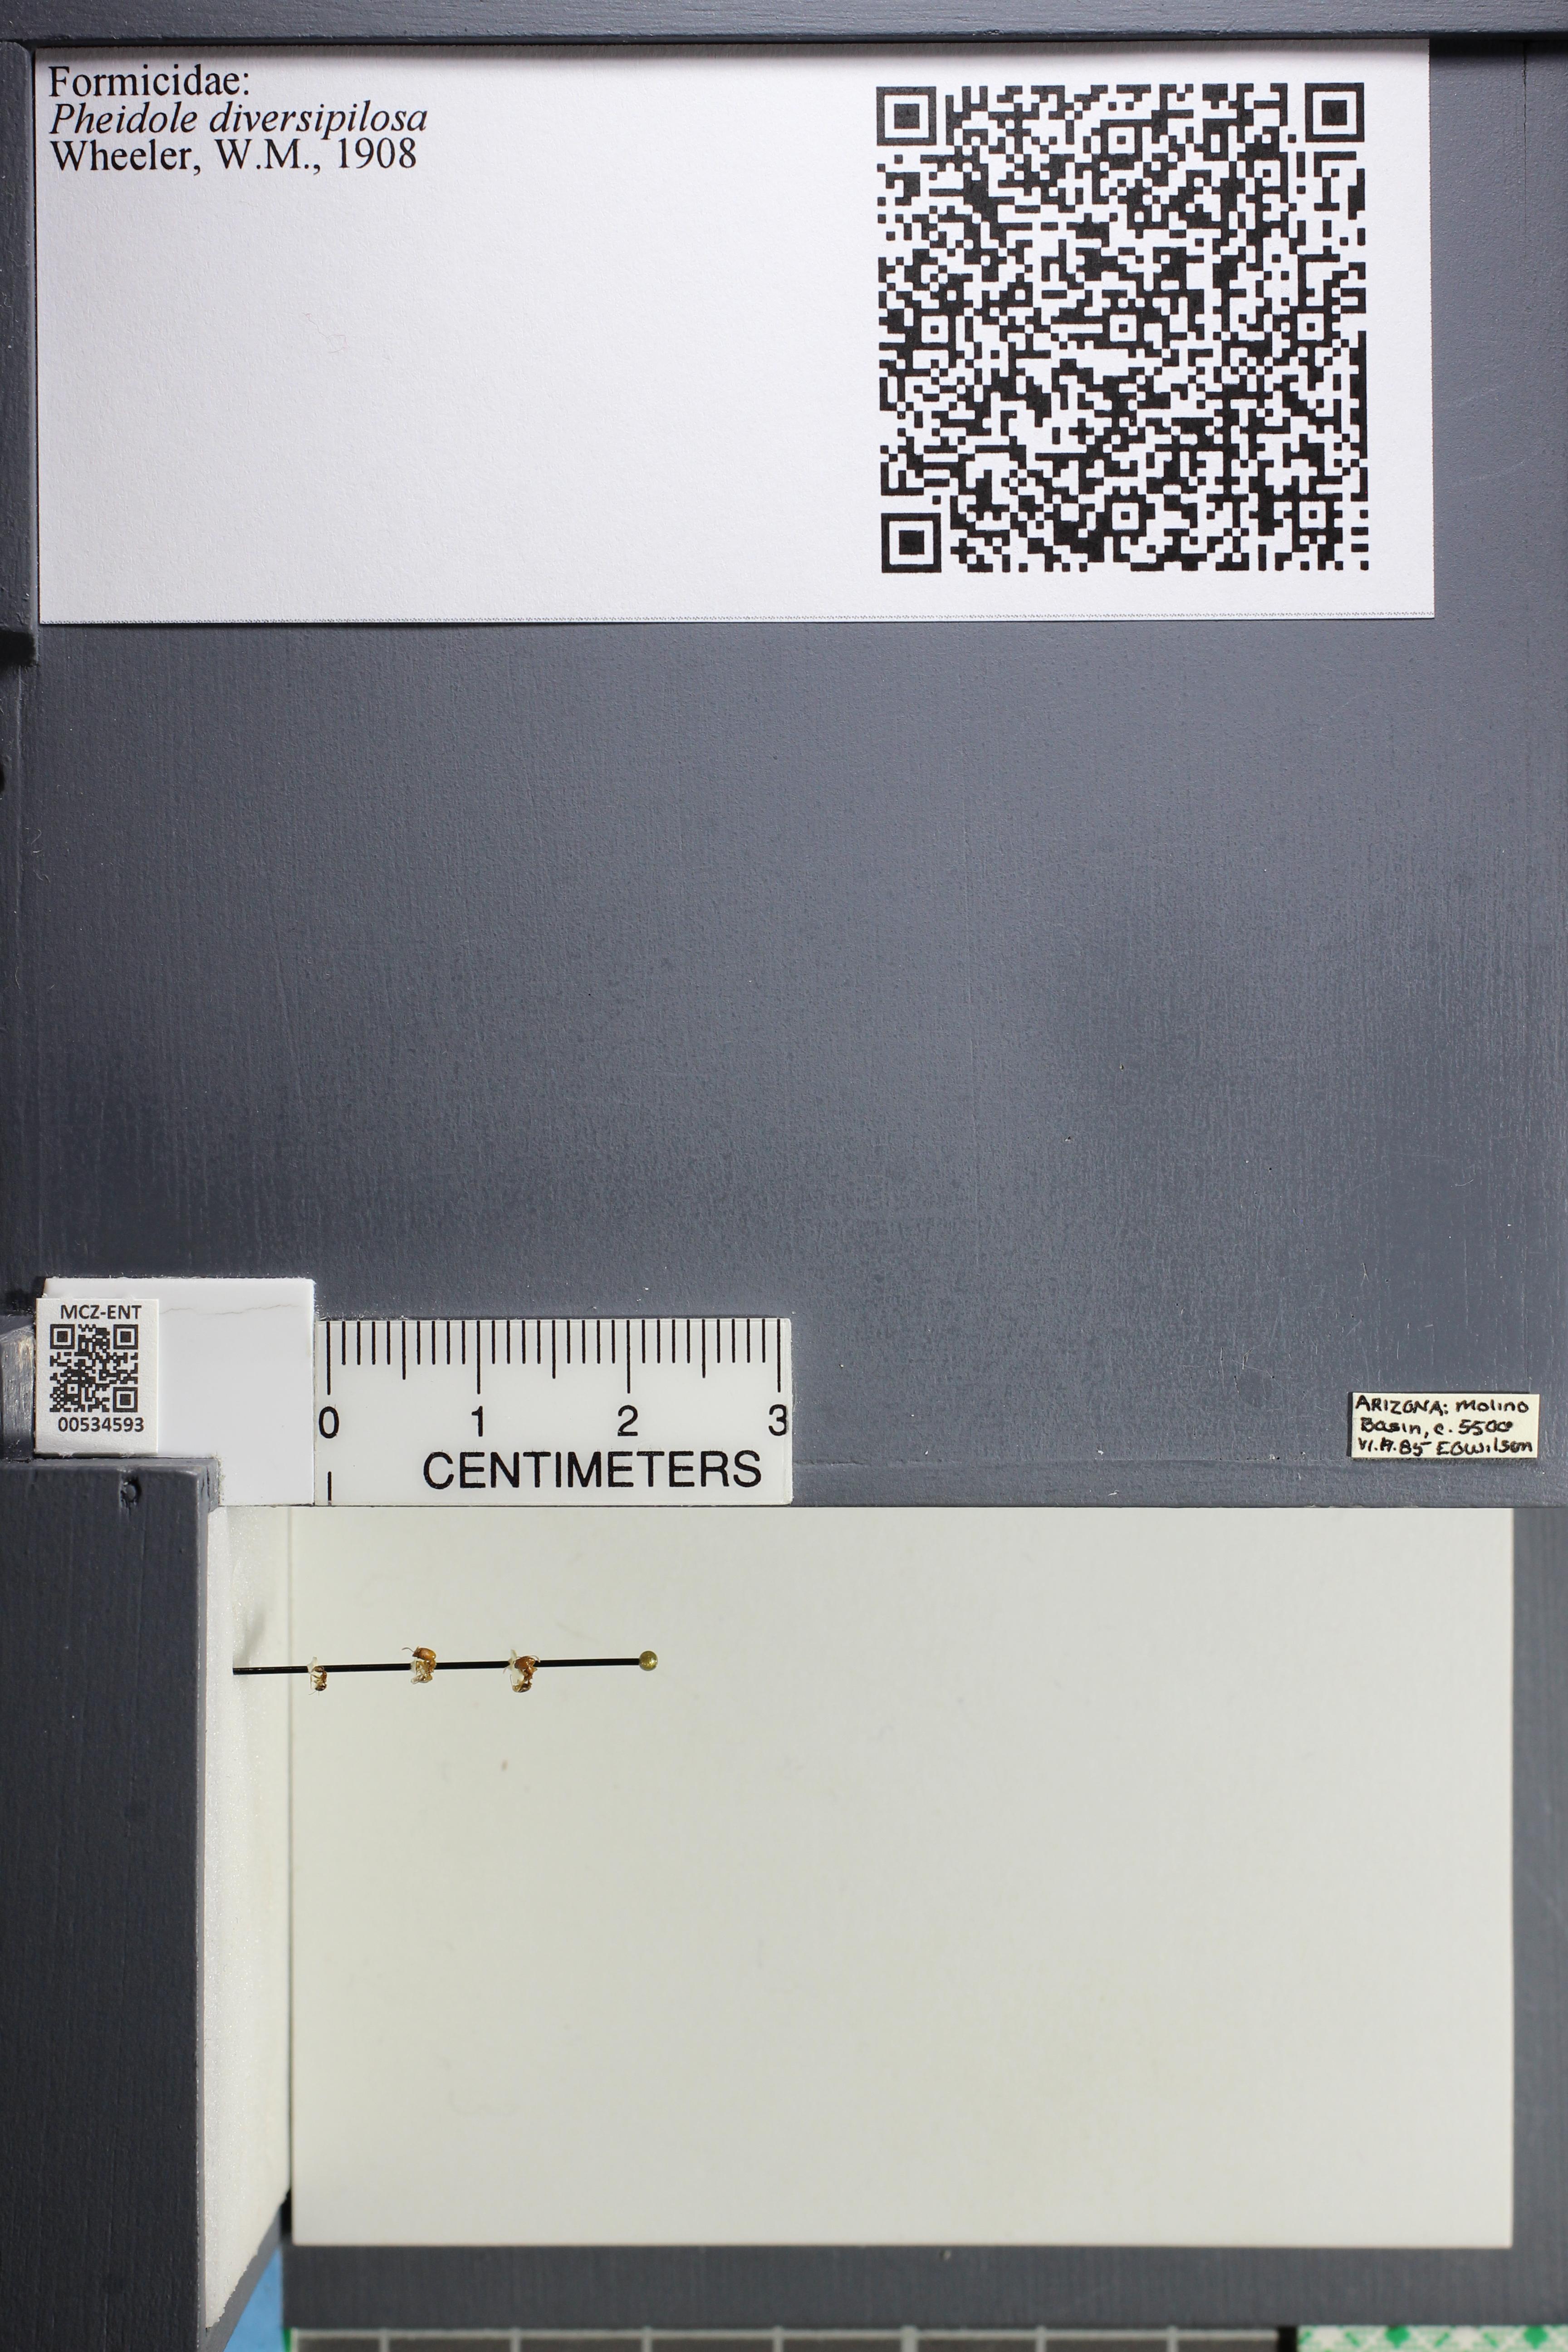 Media of type image, MCZ:Ent:534593 Identified as Pheidole diversipilosa.